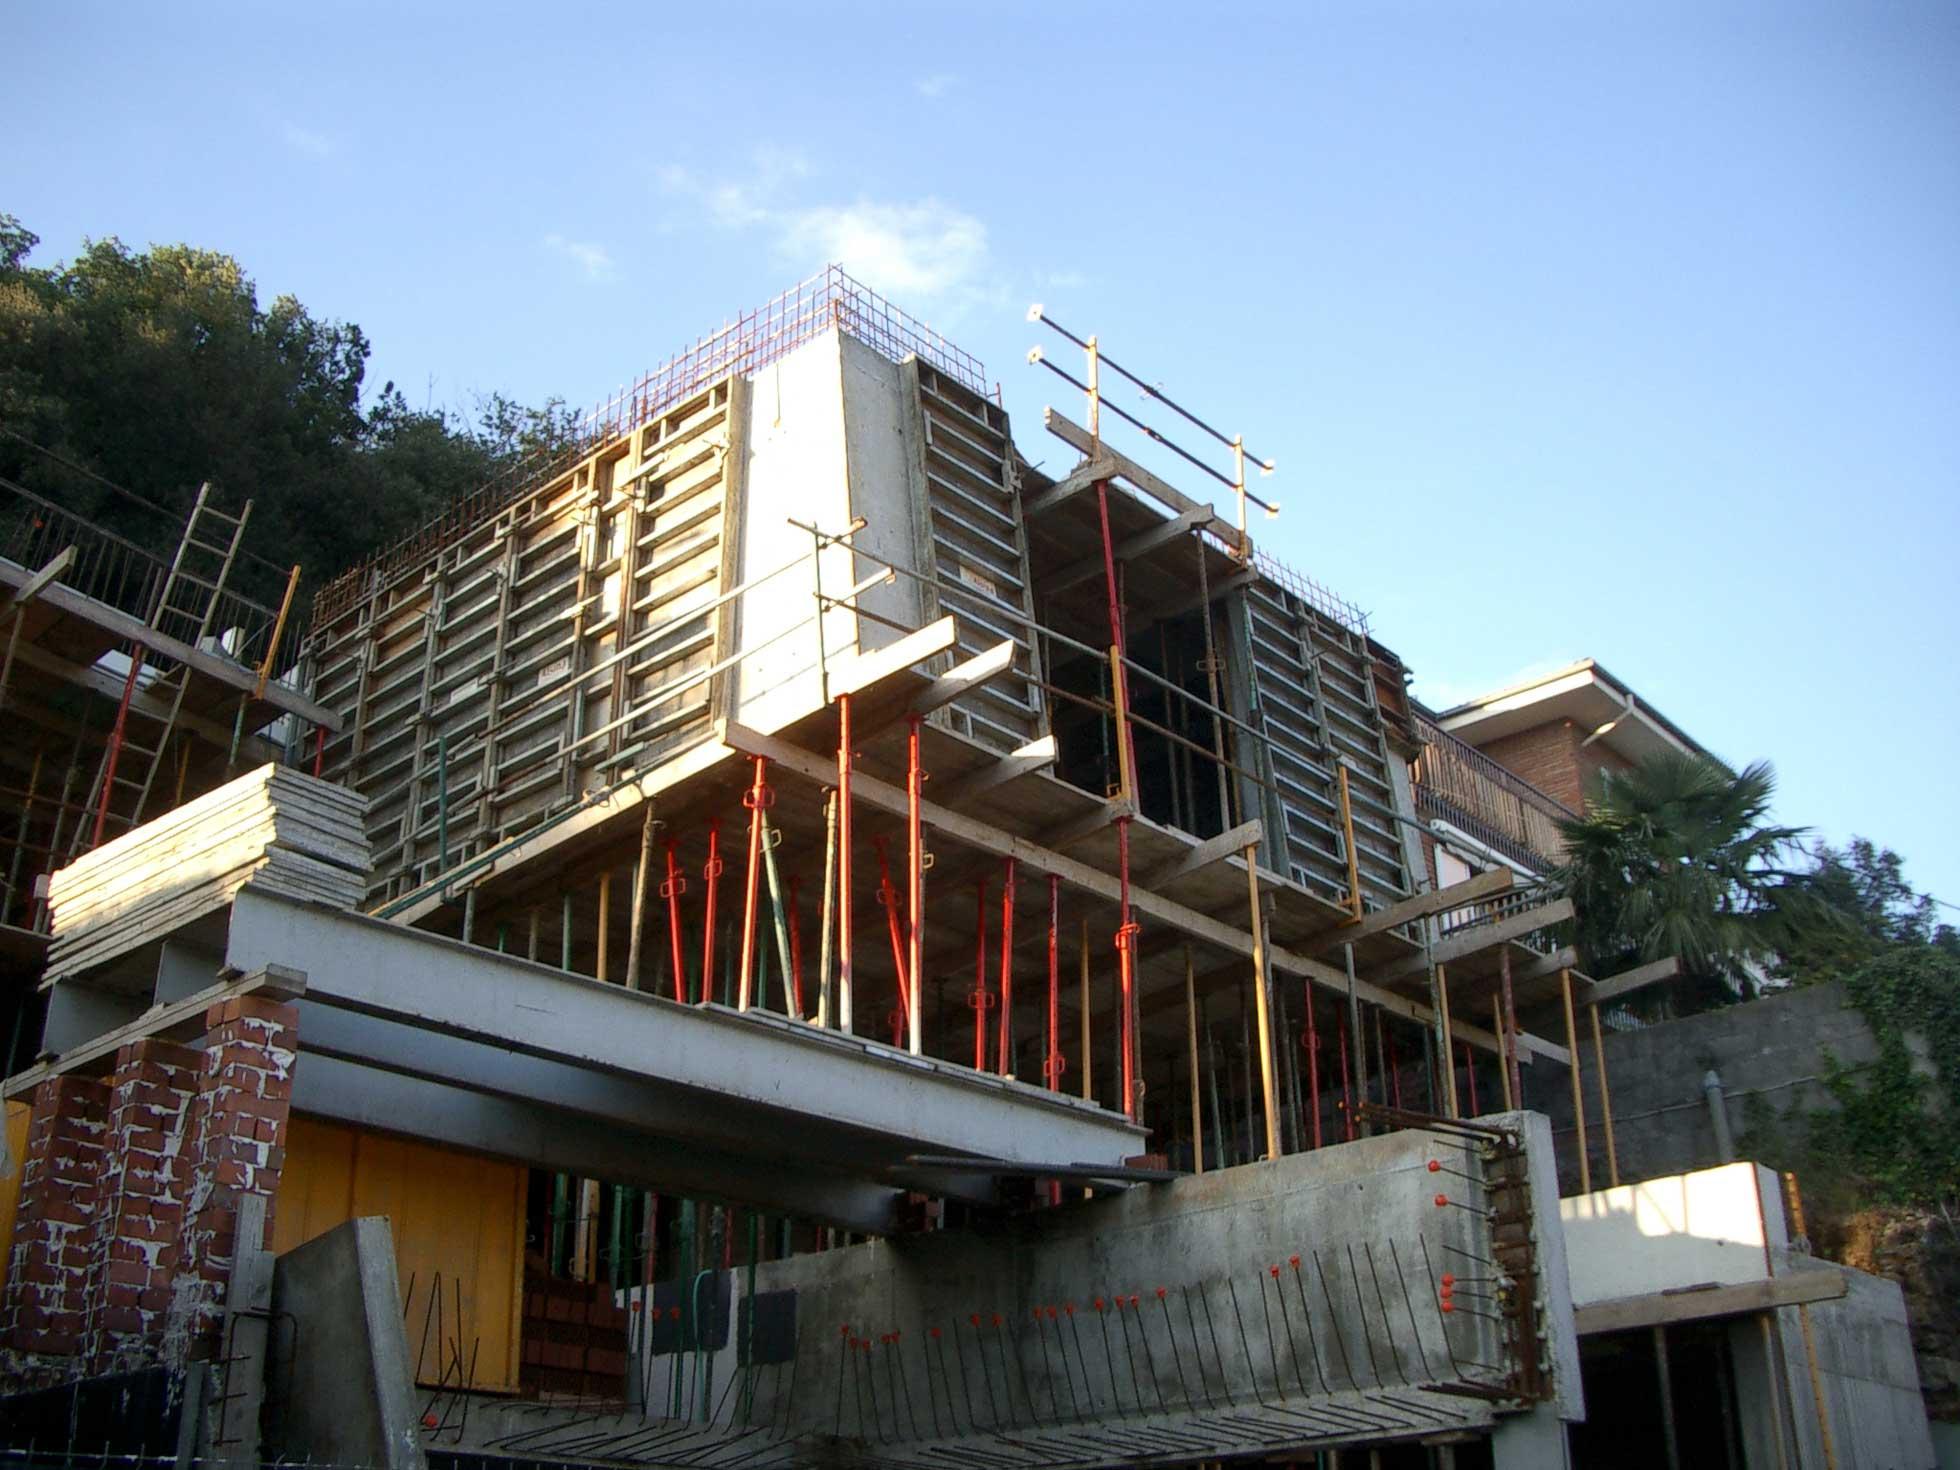 Casa pera un carpintero 4